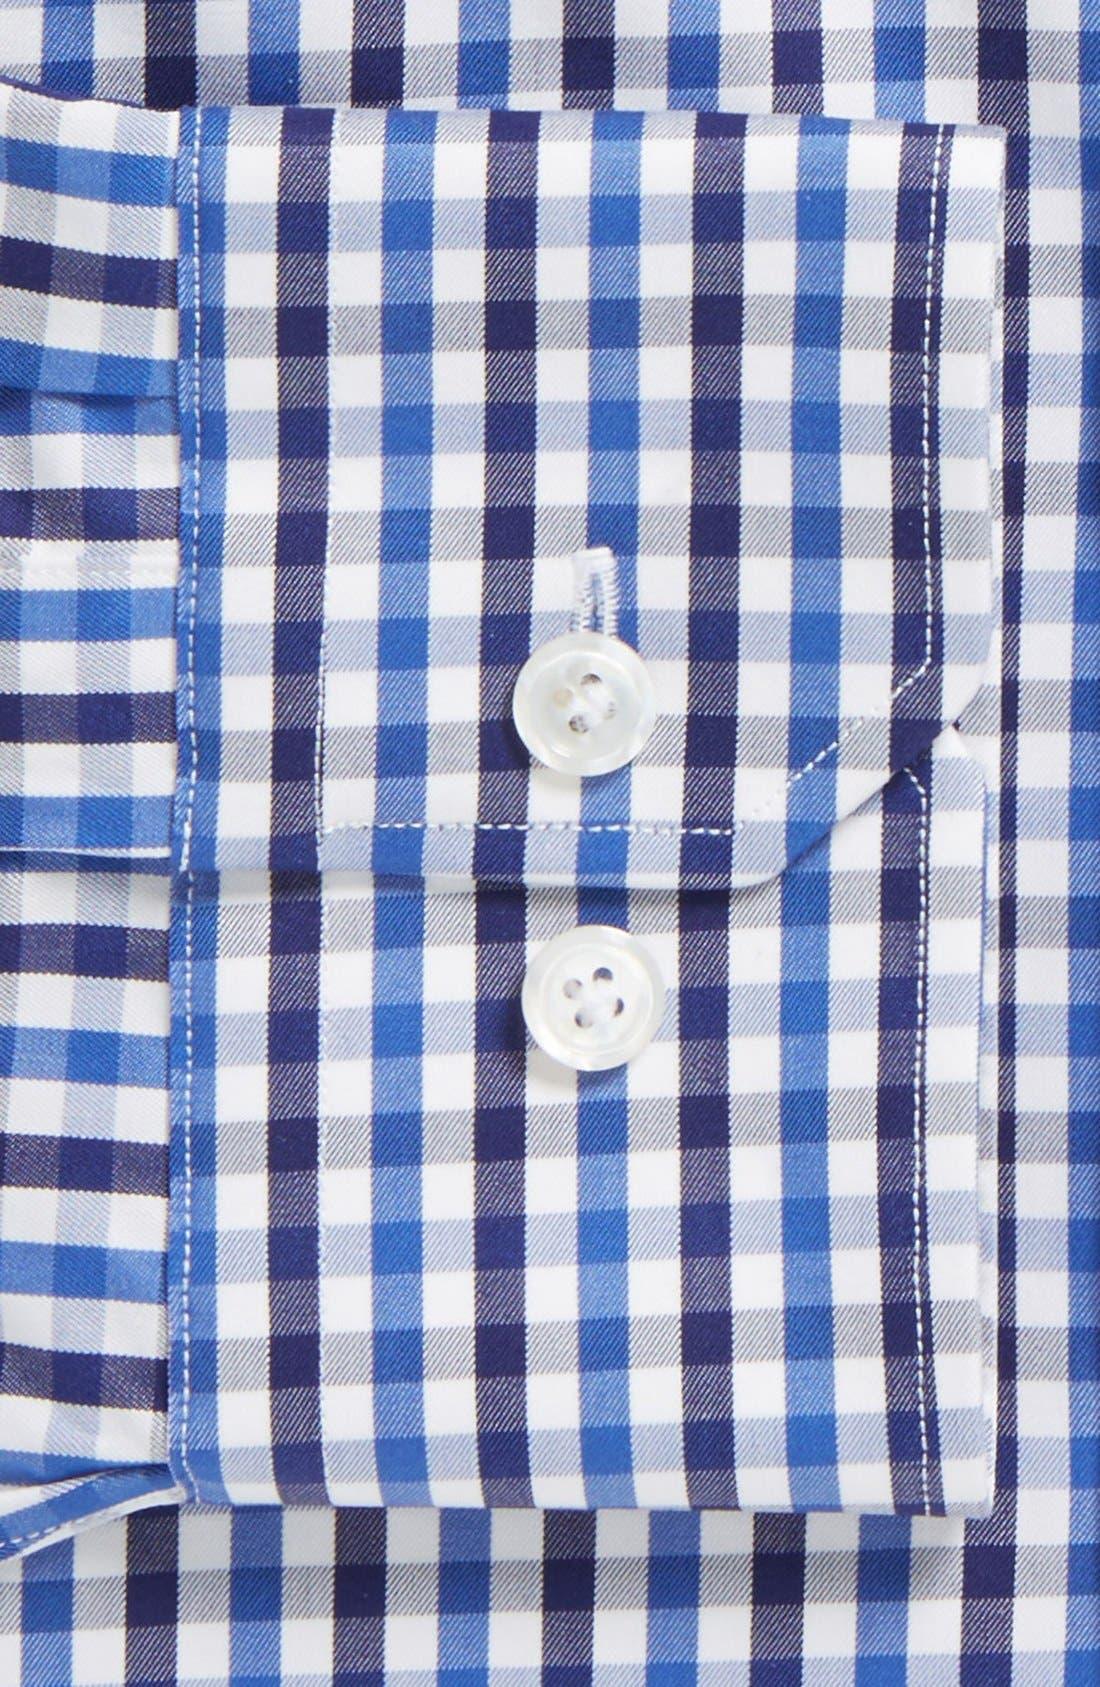 John W Nordstrom<sup>®</sup> Signature Trim Fit Check Dress Shirt,                             Alternate thumbnail 2, color,                             401